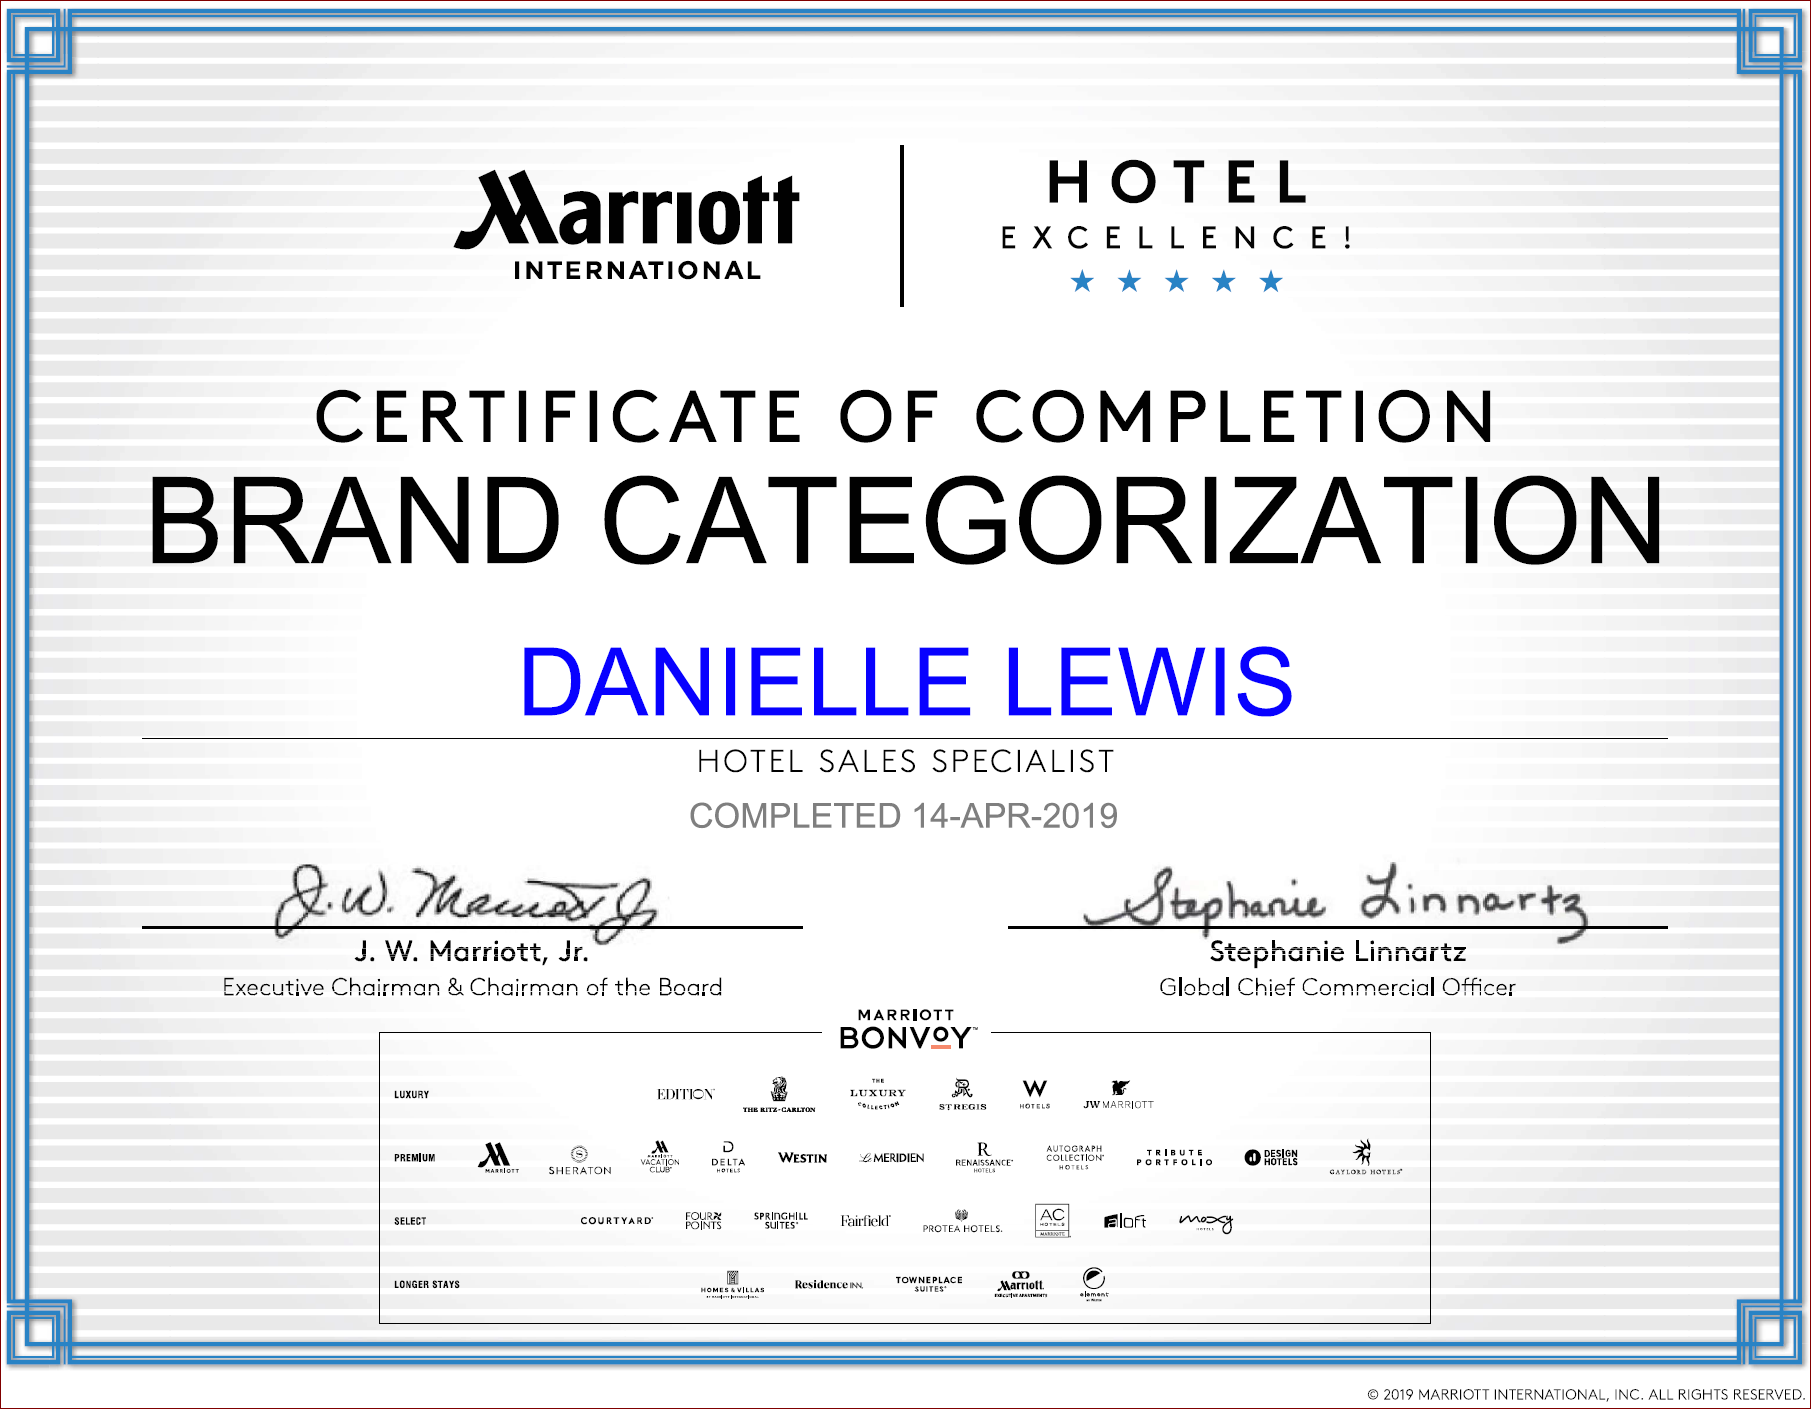 SelfishMe Travel - Marriott International Brand Categorization Certificate